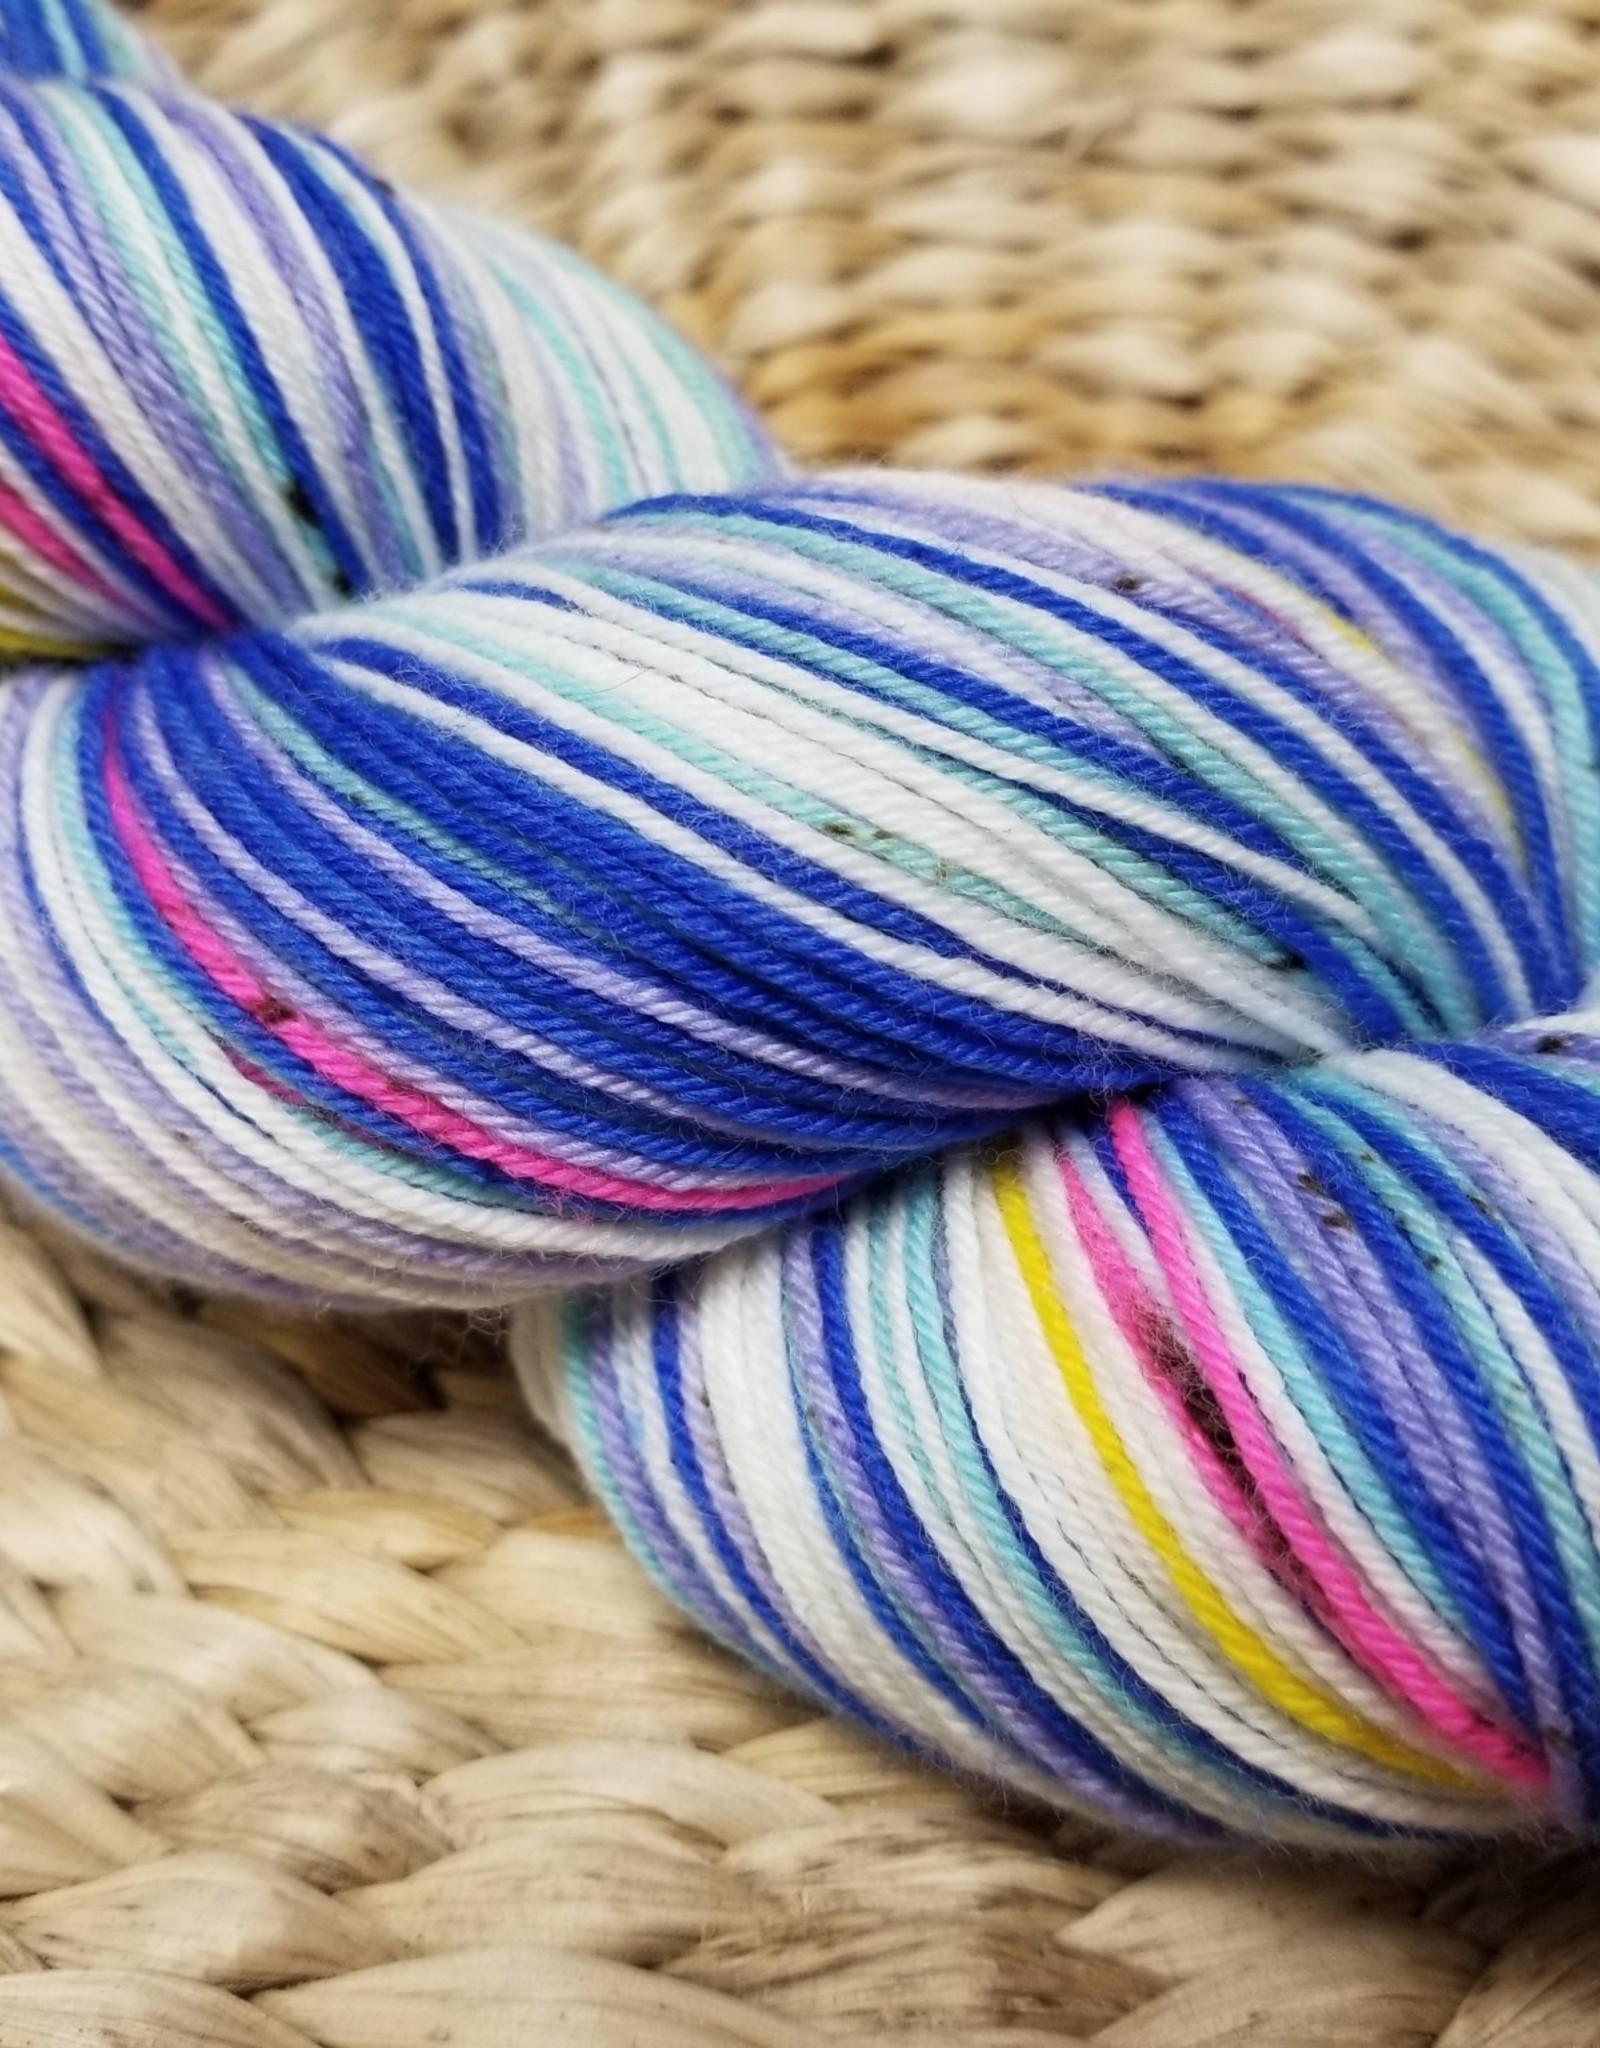 Artistic Yarns By Abi Self Striping Easter Peeps Sock Yarn